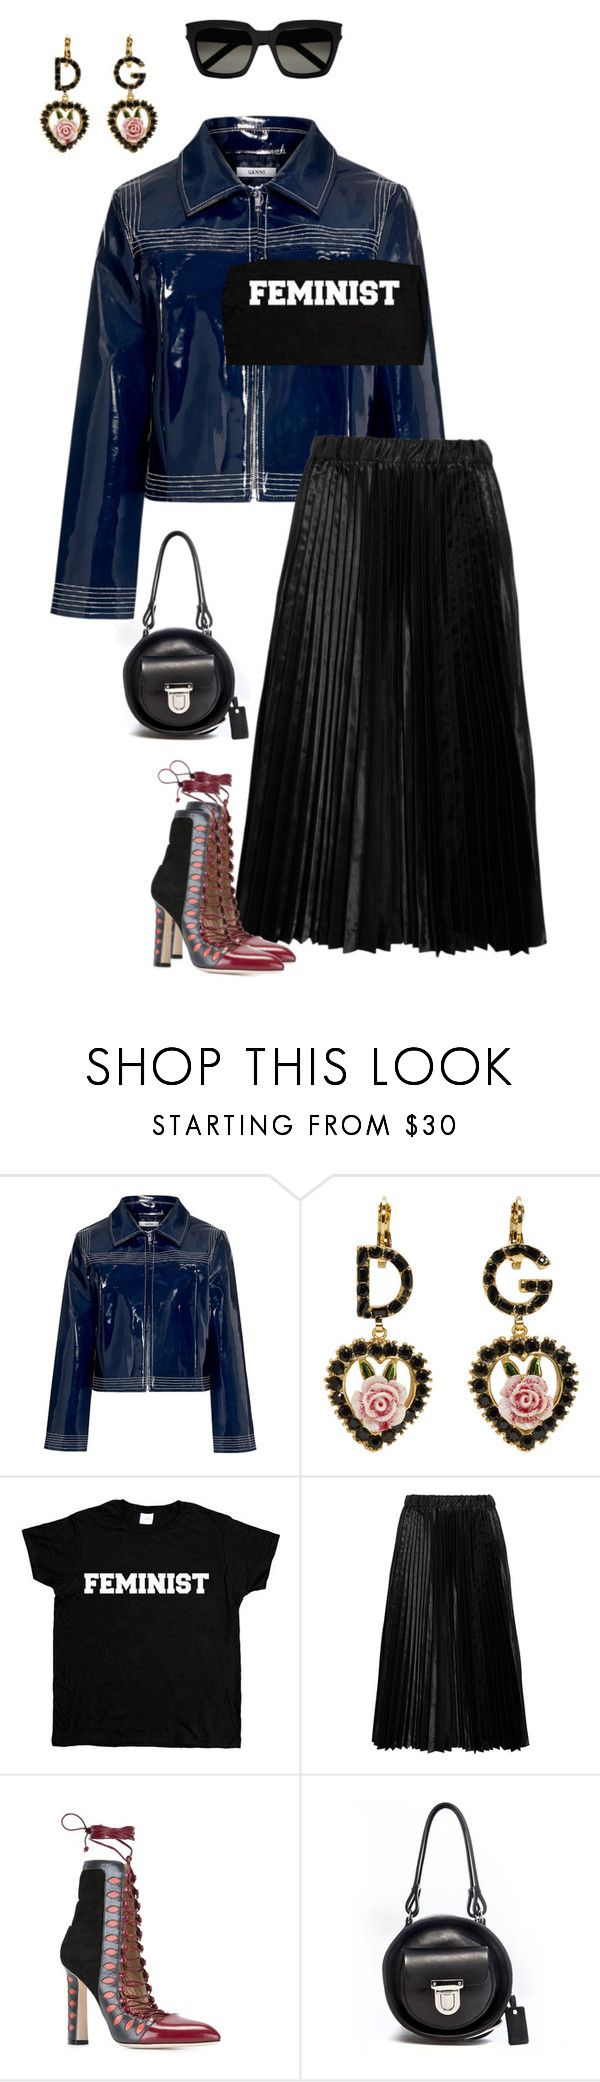 """Feminist"" by njlindo on Polyvore featuring Ganni, Dolce&Gabbana, Comme des Garçons GIRL, Paula Cademartori, Alisa Smirnova and Yves Saint Laurent"